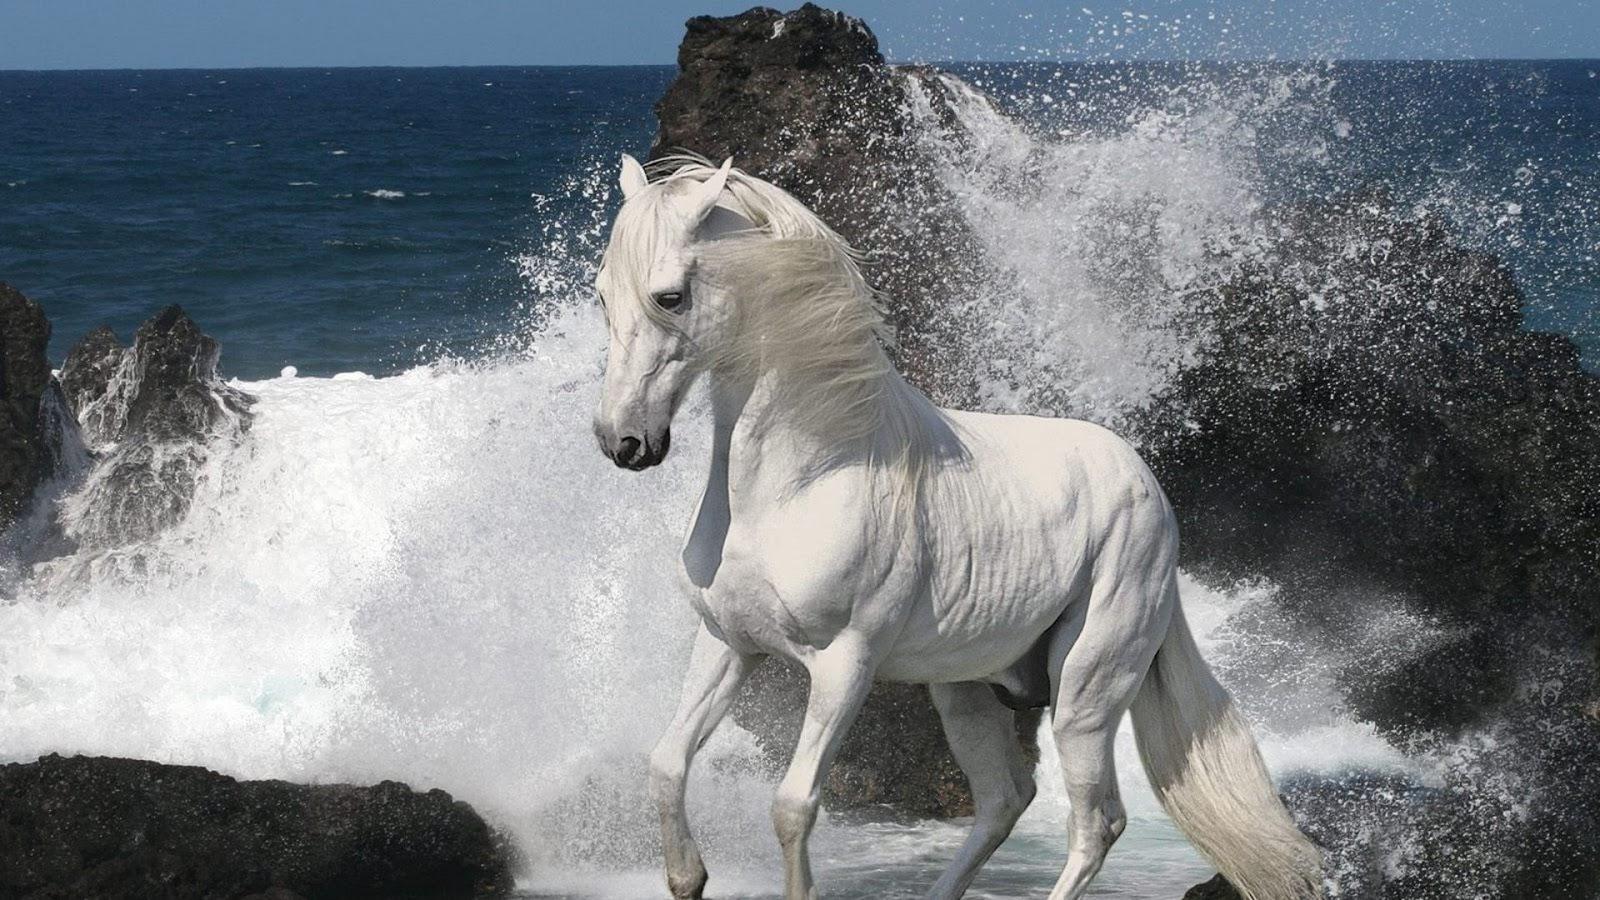 Running Black Horse Hd Wallpaper Download